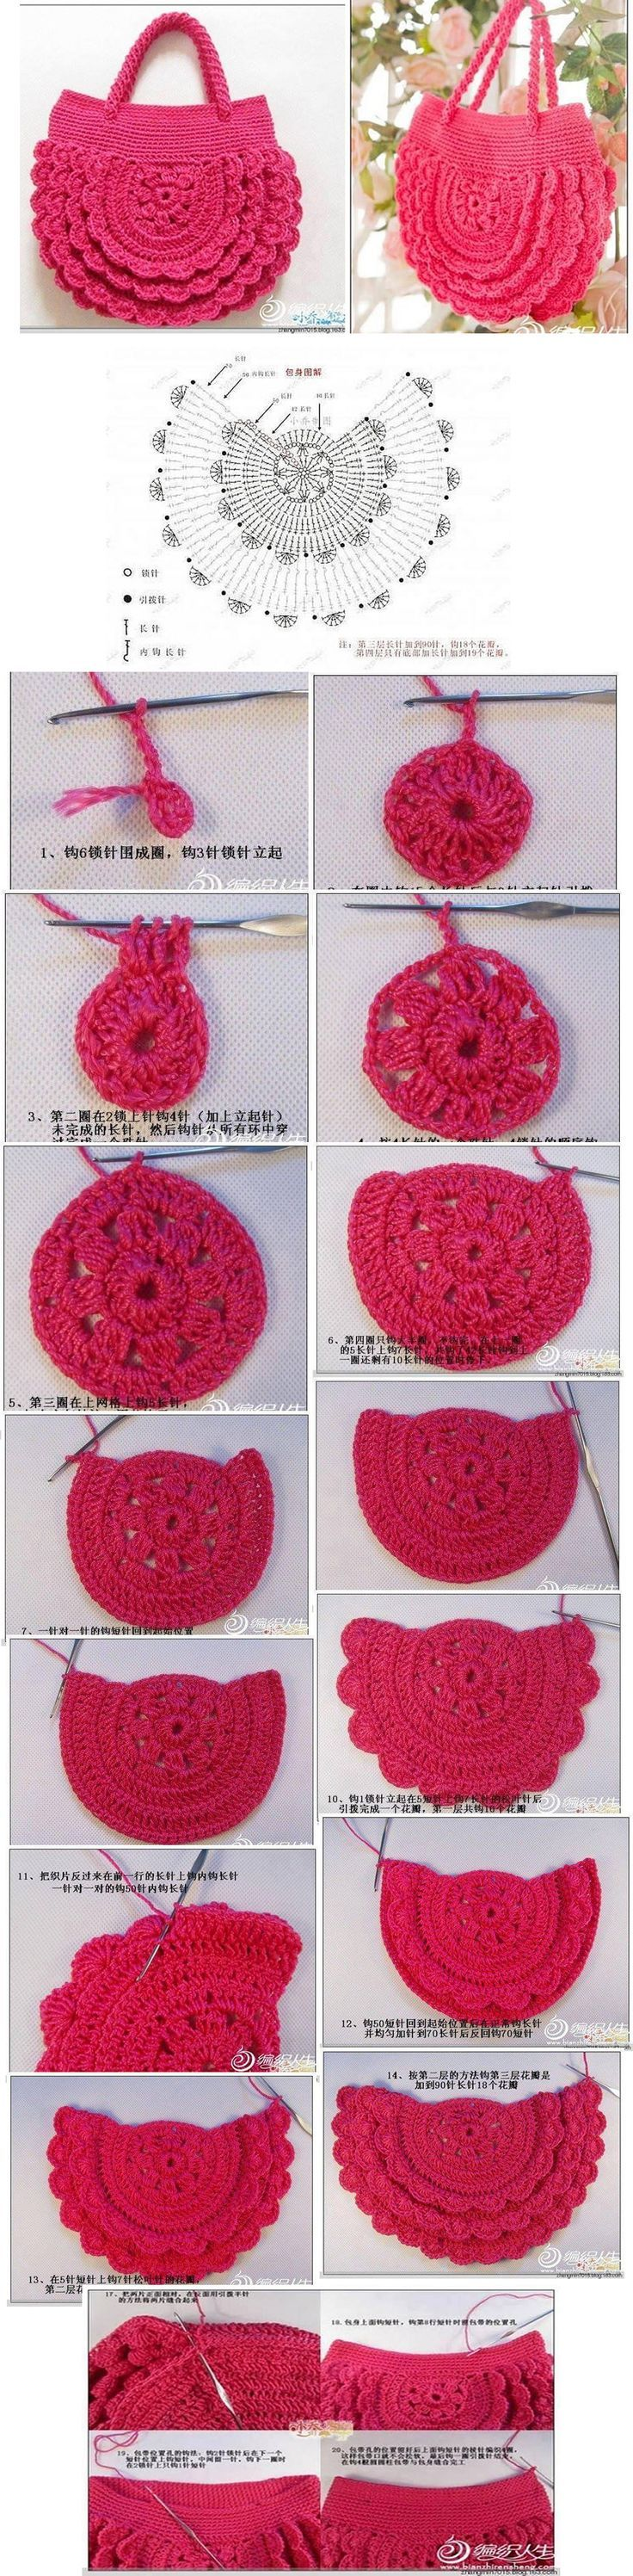 "Cartera - Crochet [   ""- Crochet bag with pattern"" ] #<br/> # #Crocheted #Purses,<br/> # #Crochet #Handbags,<br/> # #Knit #Crochet,<br/> # #Pin #Weaving,<br/> # #Crocheting,<br/> # #Ideas,<br/> # #Knitting,<br/> # #Stitches,<br/> # #Crochet #Portfolio<br/>"